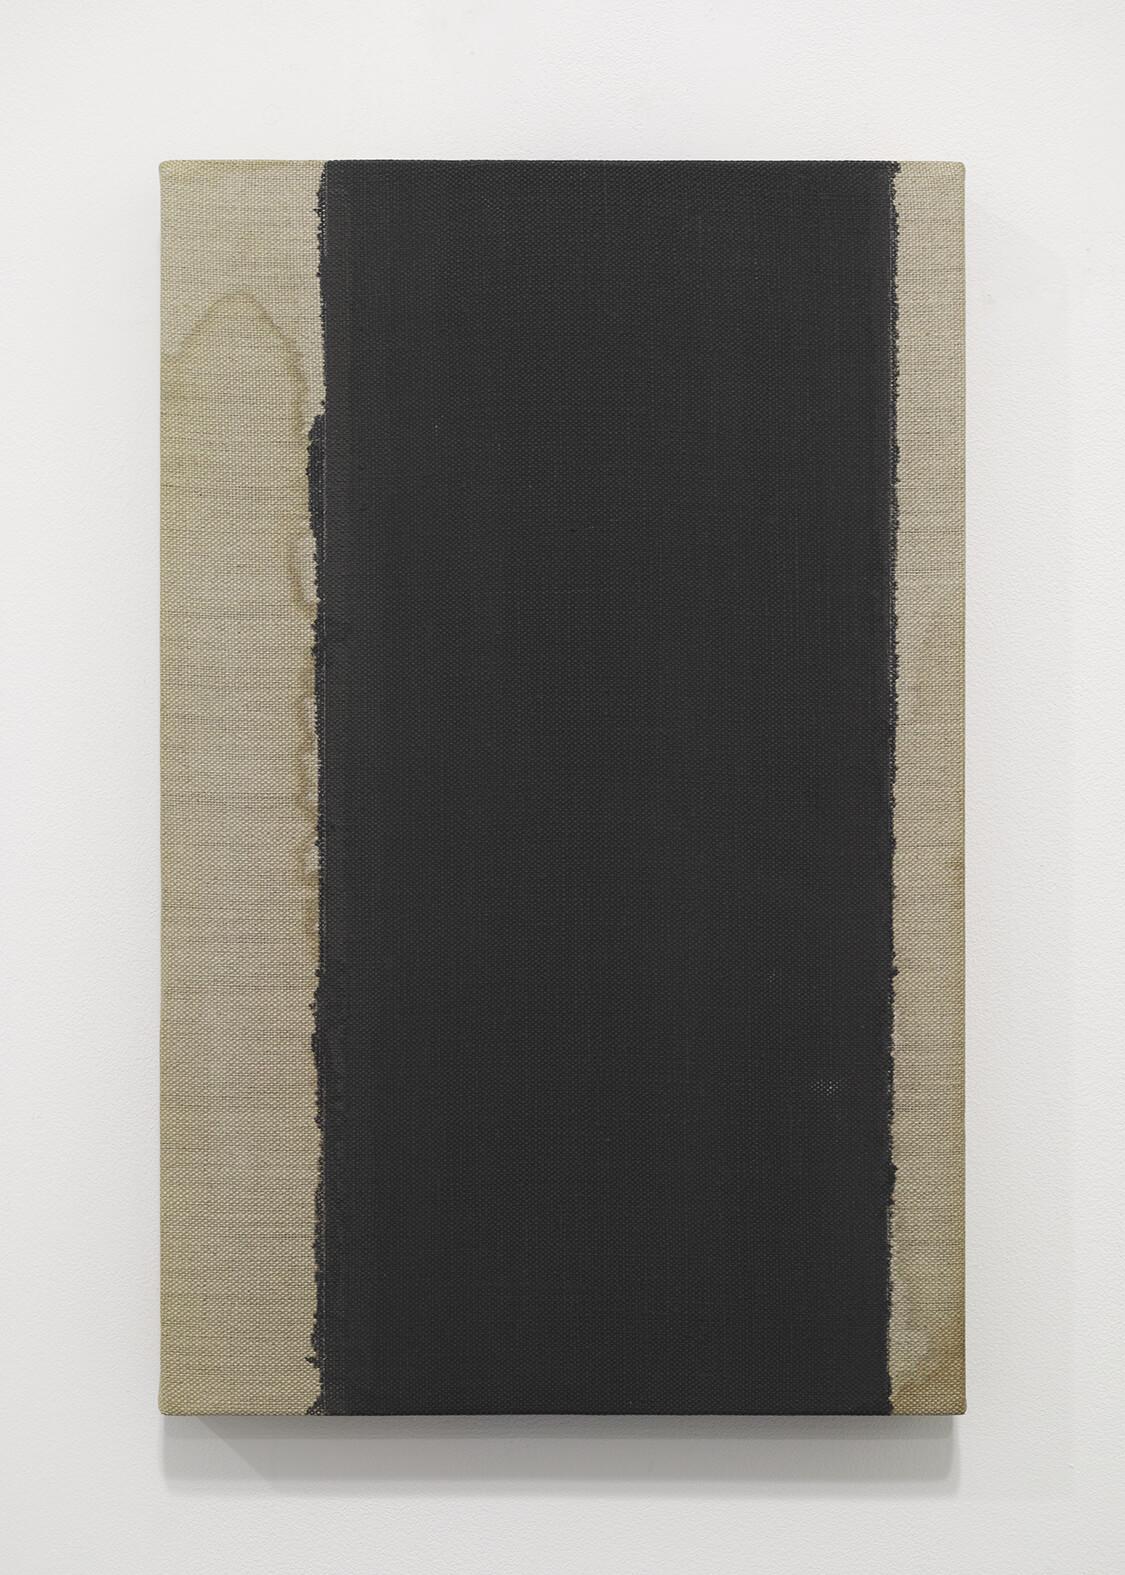 <b>UMBER-BLUE 1986-87</b><br>Oil on Canvas<br>40.8 x 31.6 cm